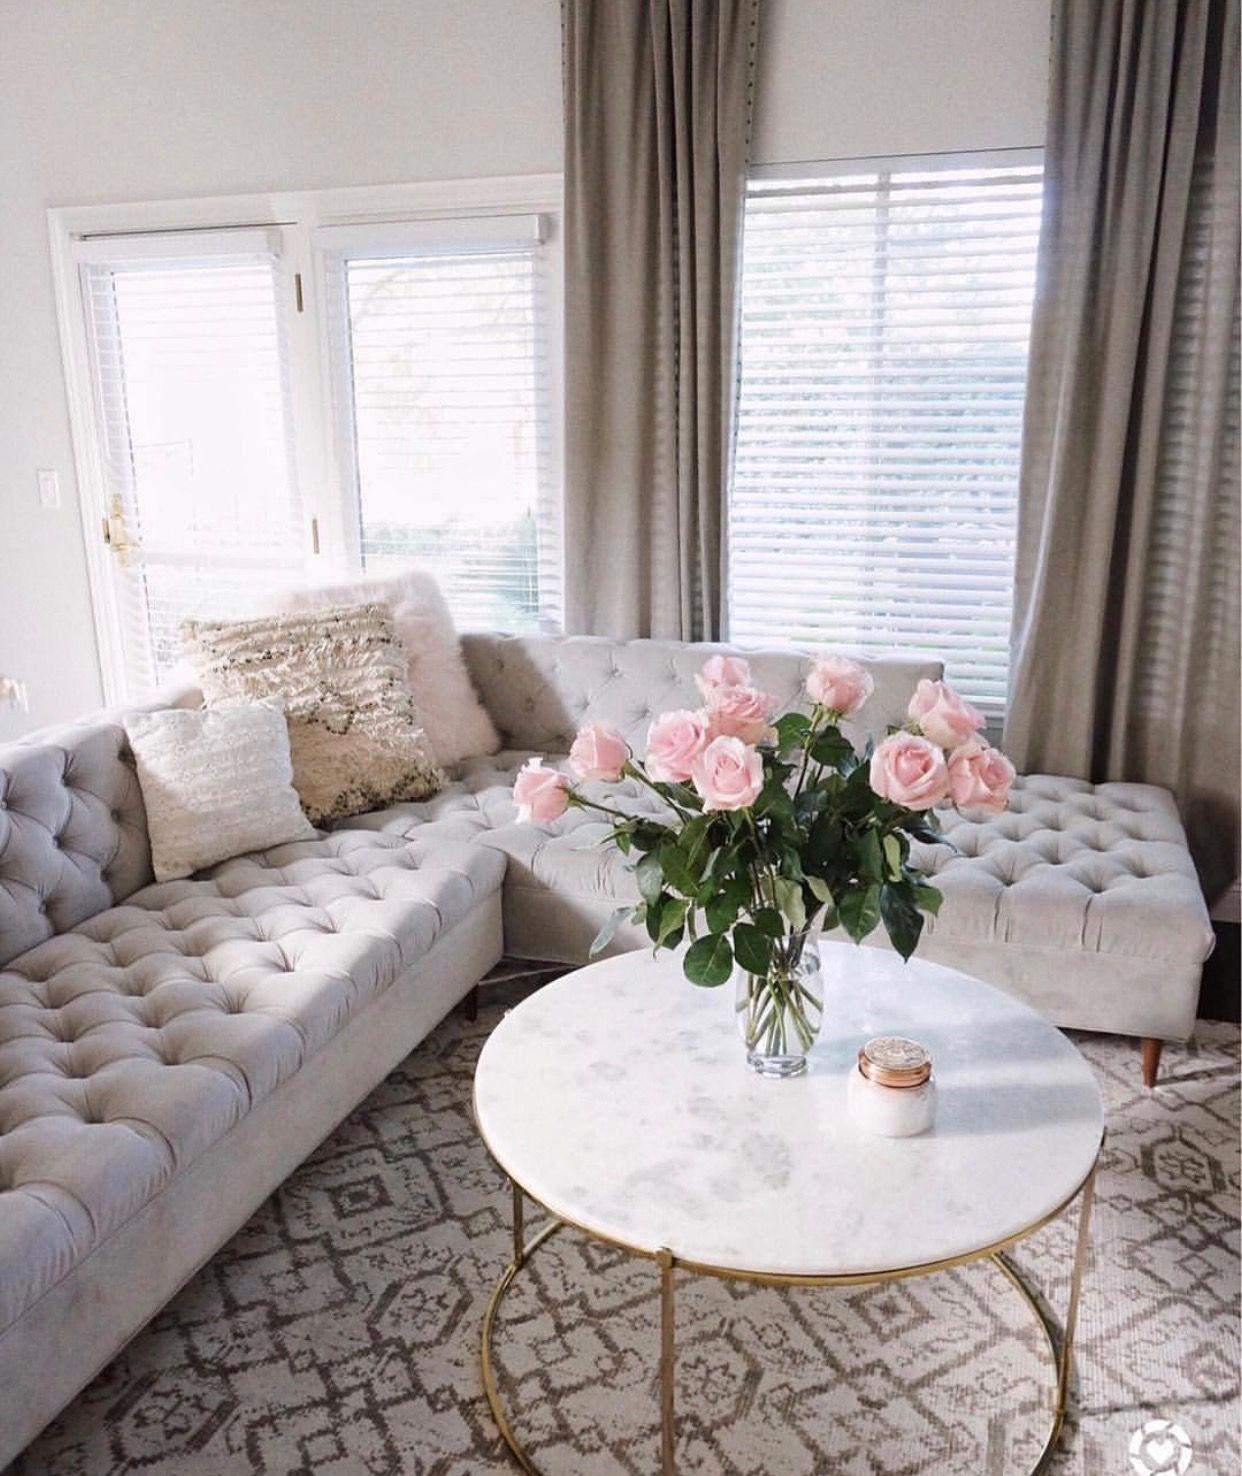 Pin by Miranda Chircop on Living Room ideas | Pinterest | Living ...